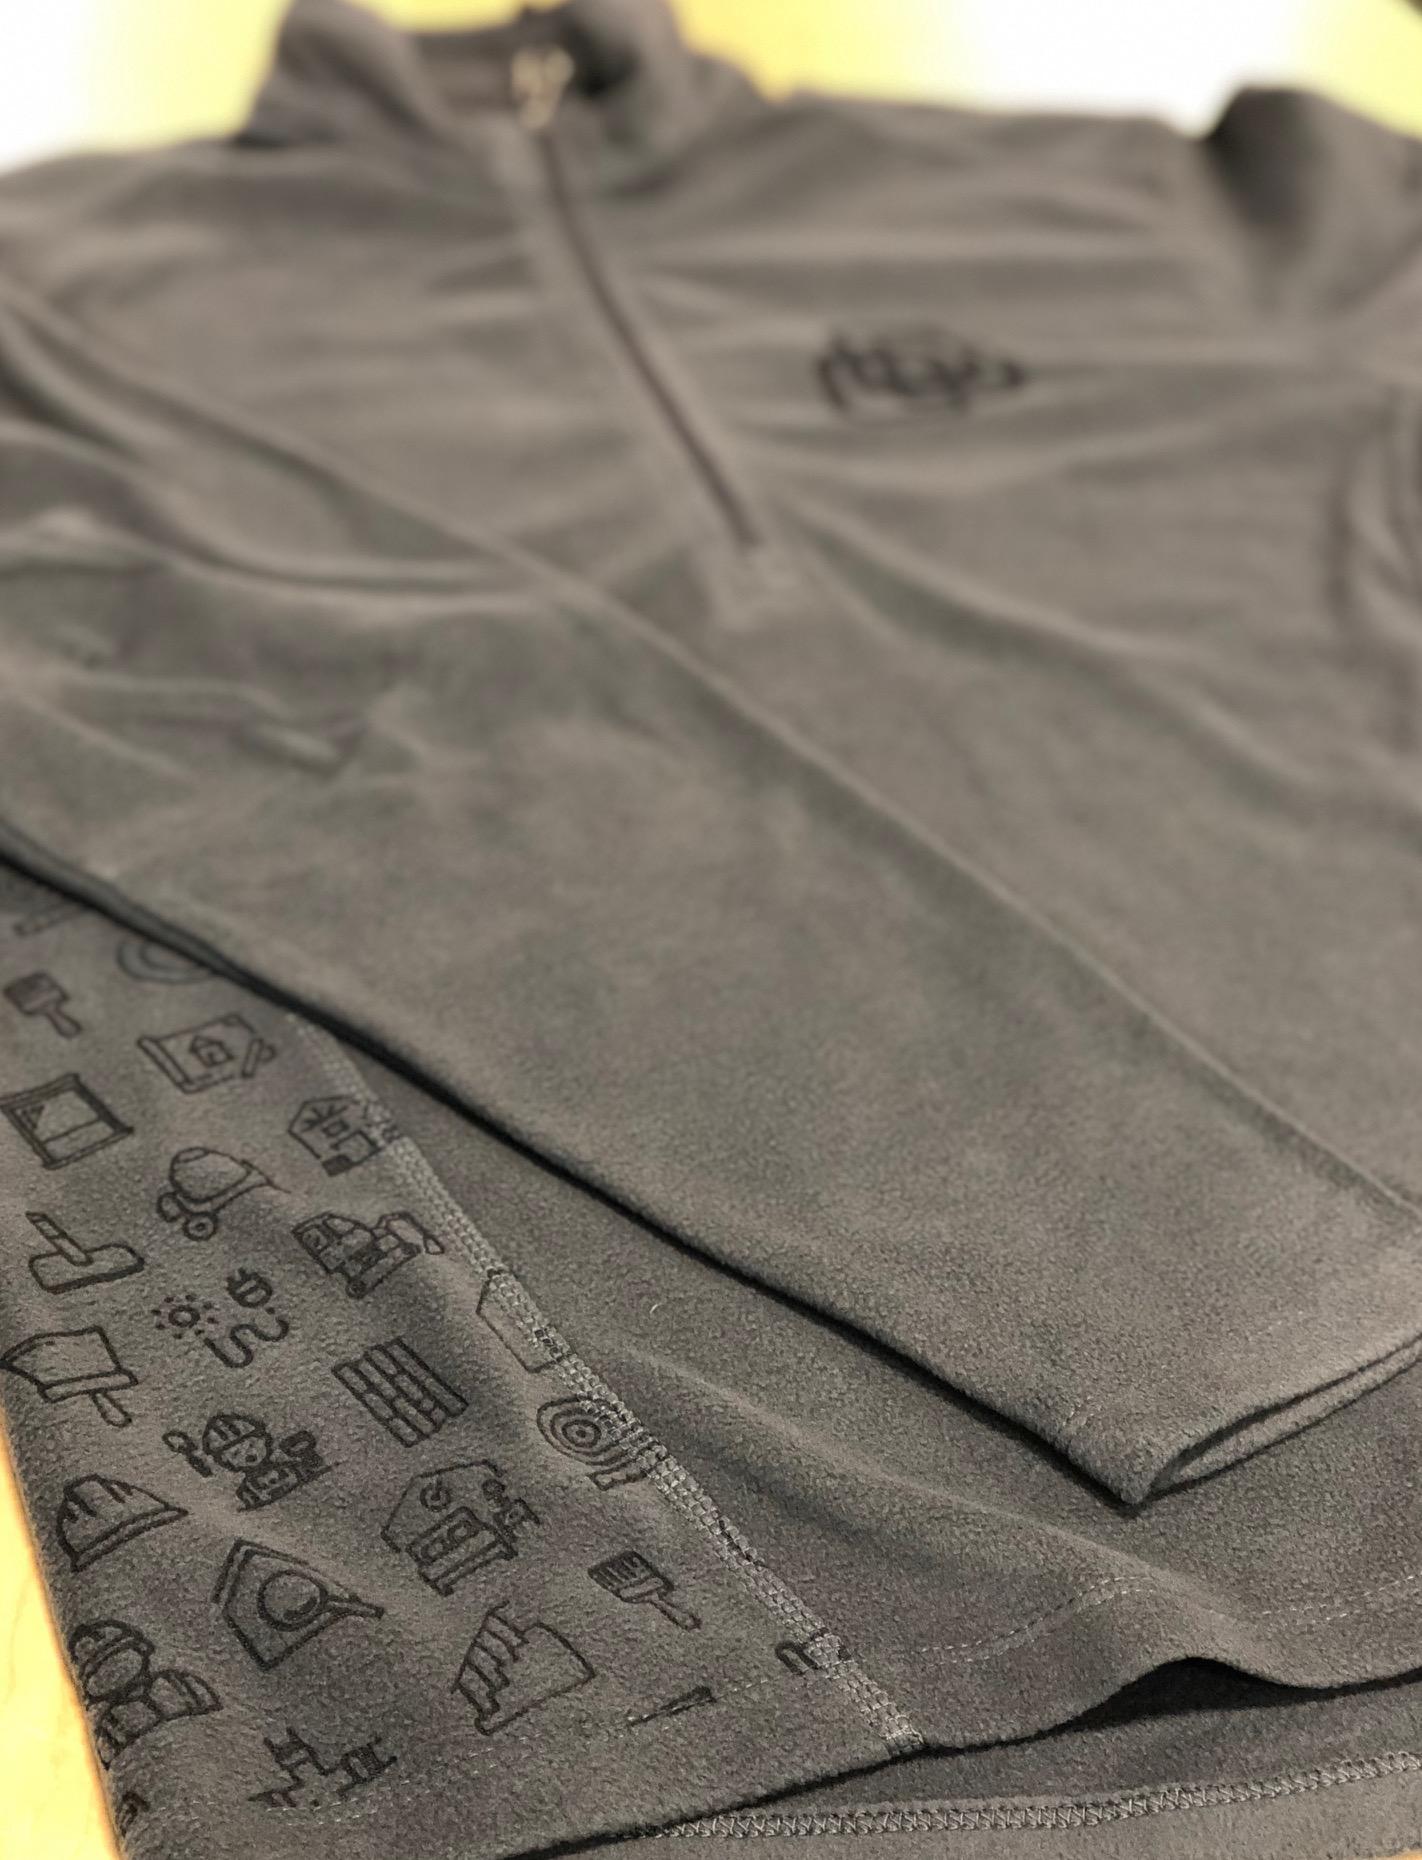 logounltd_laser_etching_embroidery_screen_printing_apparel_uniform_custom_tshirts_kirkland_bellevue_seattle_redmond_woodinville_branded_merchandise_promotional_products_logo_unltd_ tshirts_design_custom (11).jpg